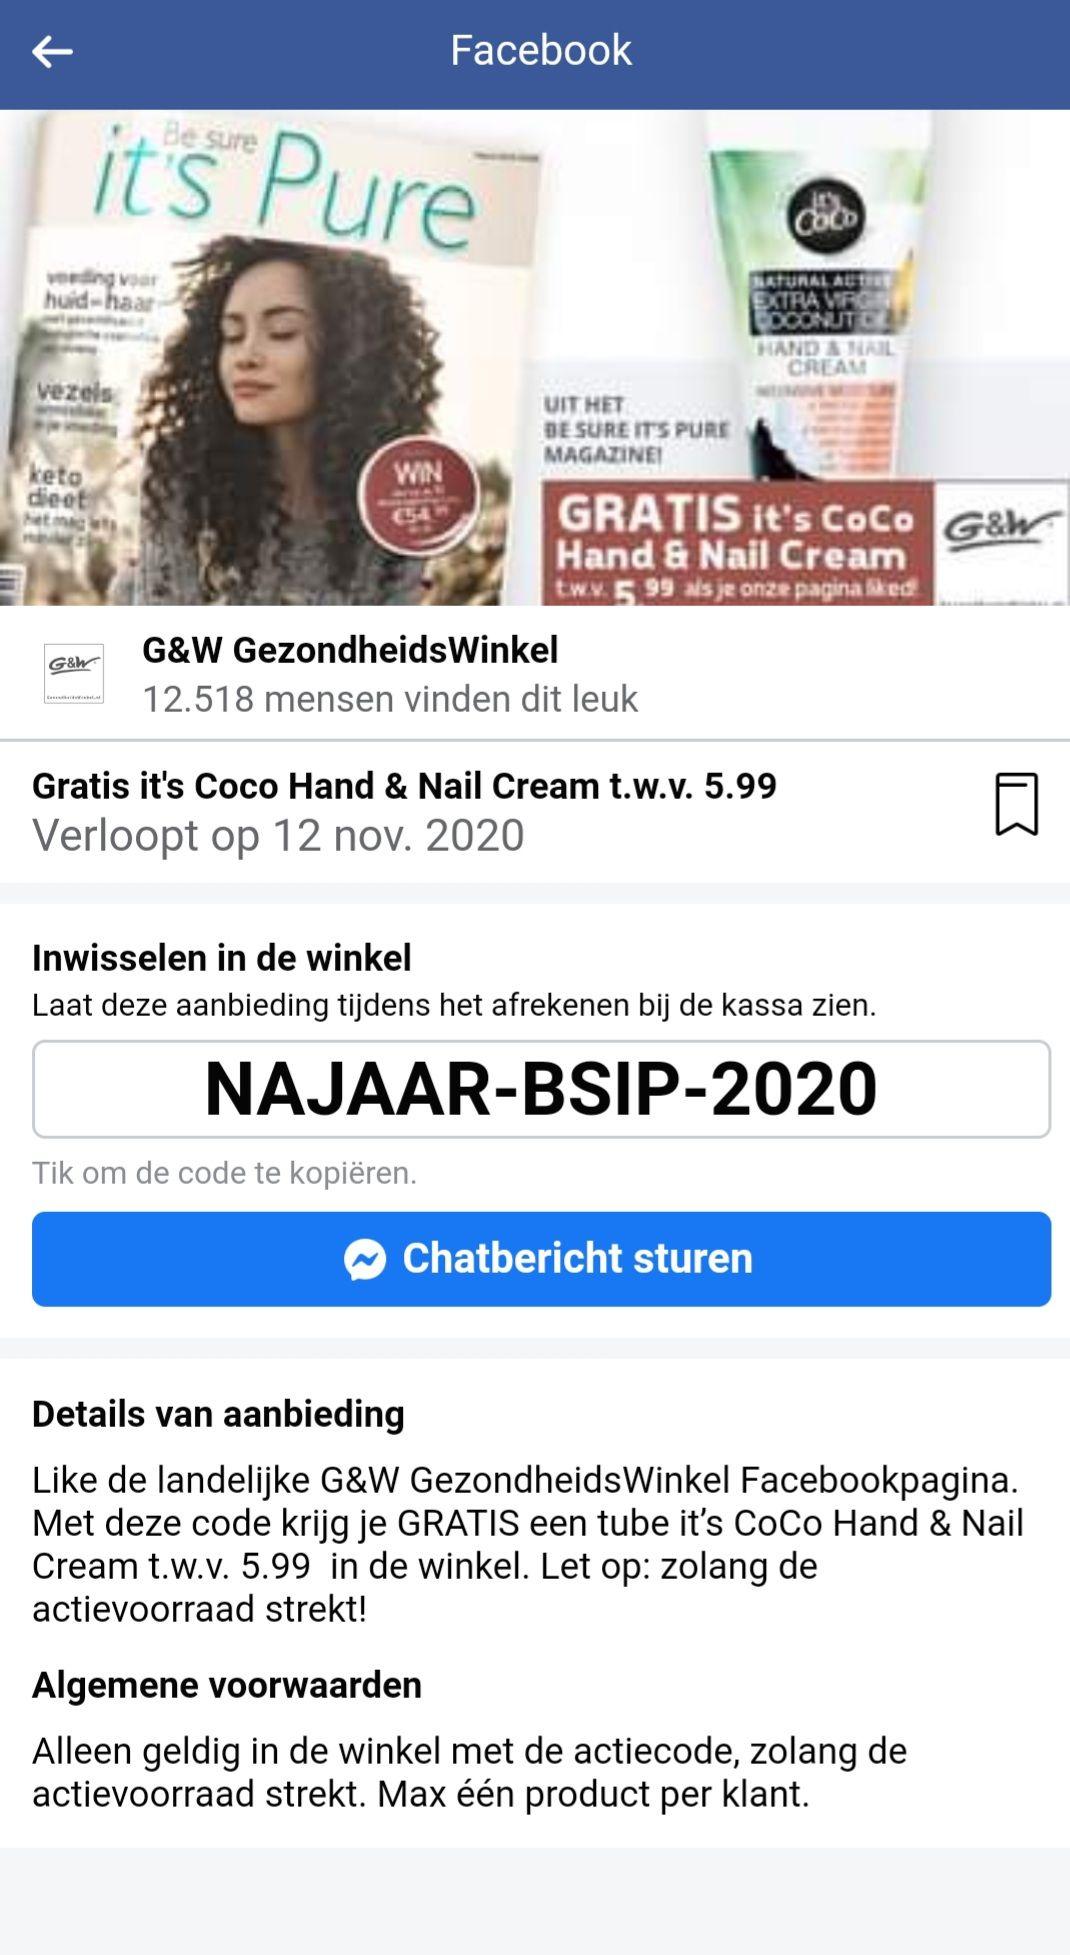 G&W Gezondheidswinkel - Gratis it's CoCo Hand & Nail Cream t.w.v. € 5,99